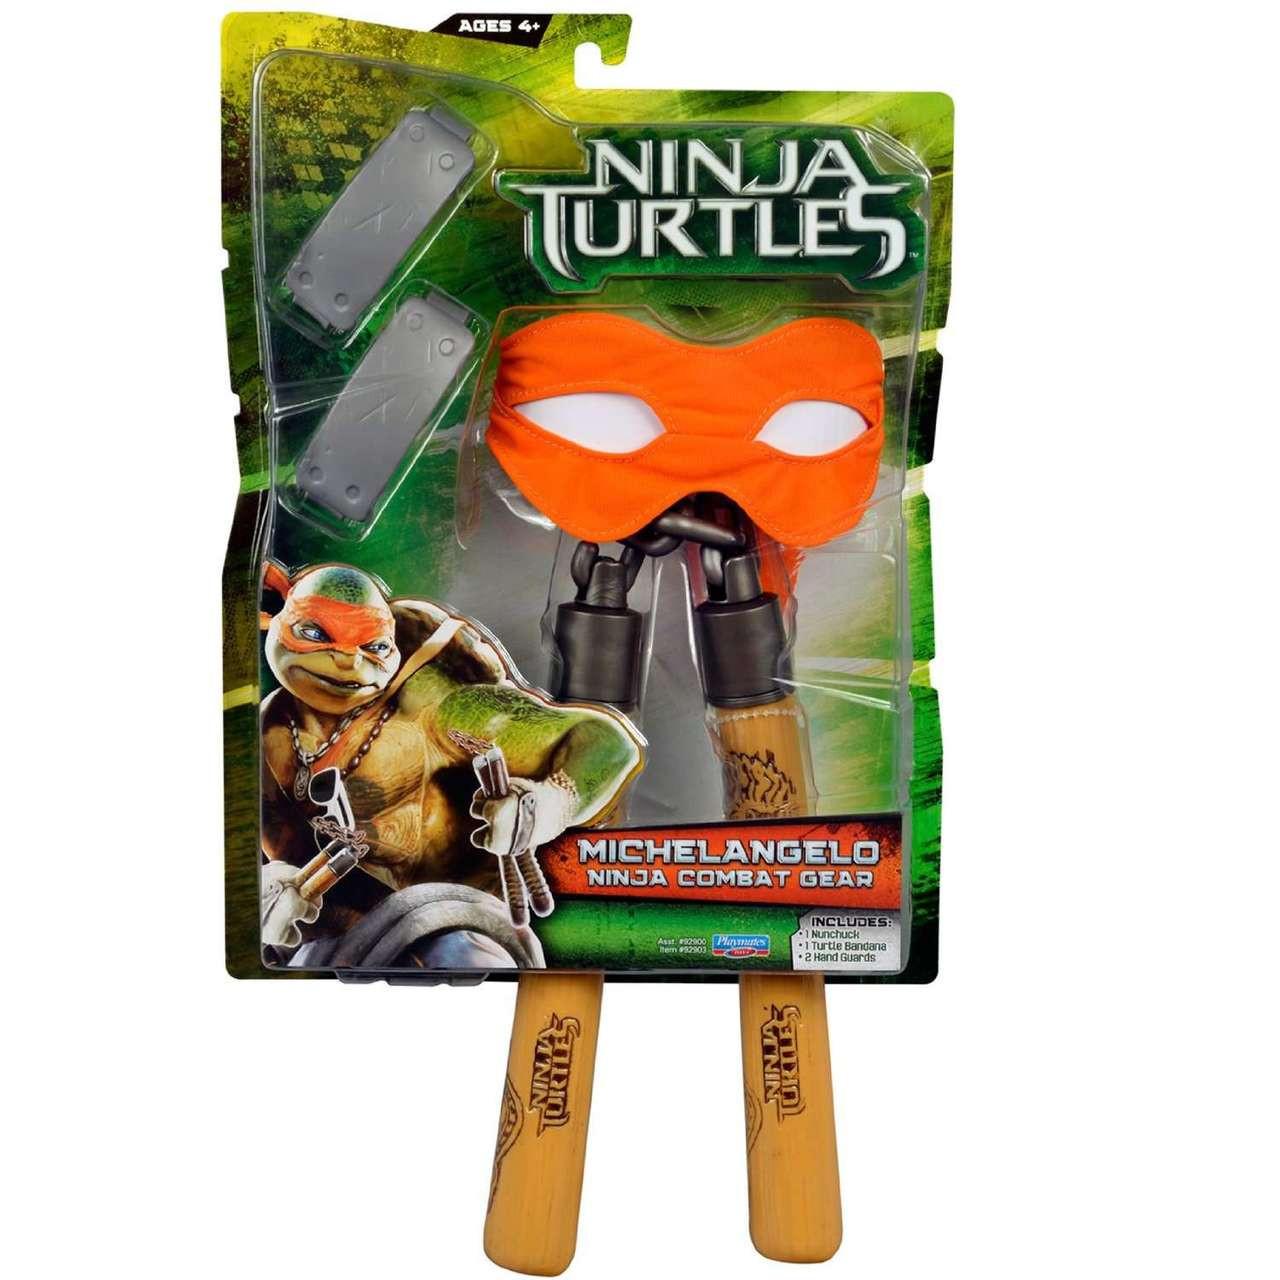 Michelangelo Teenage Mutant Ninja Turtles 2014 movie action figure